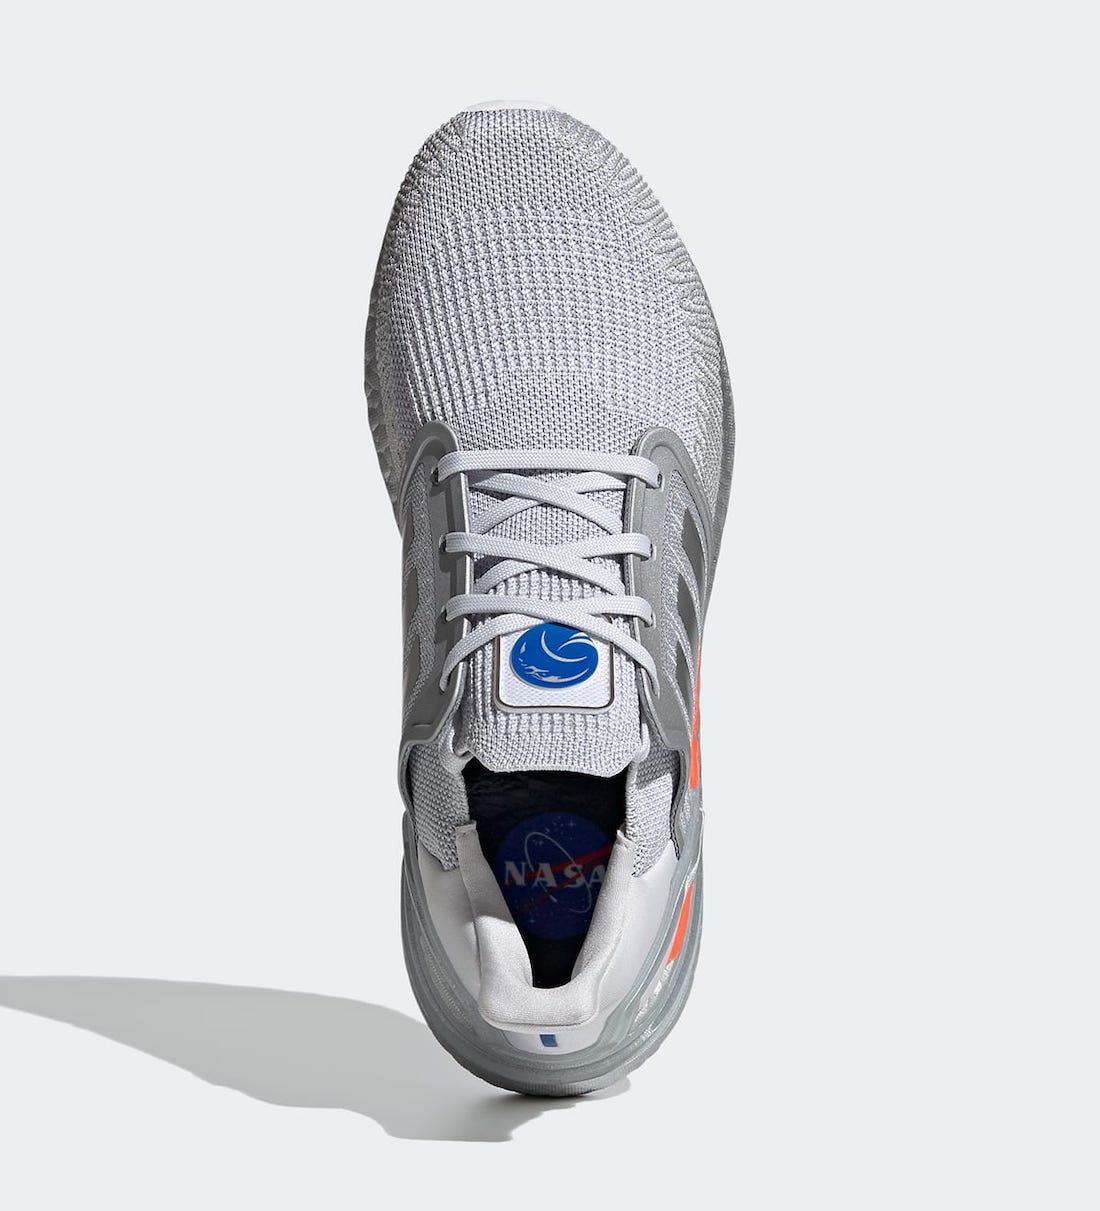 NASA adidas Ultra Boost 2020 FX7957 Release Date